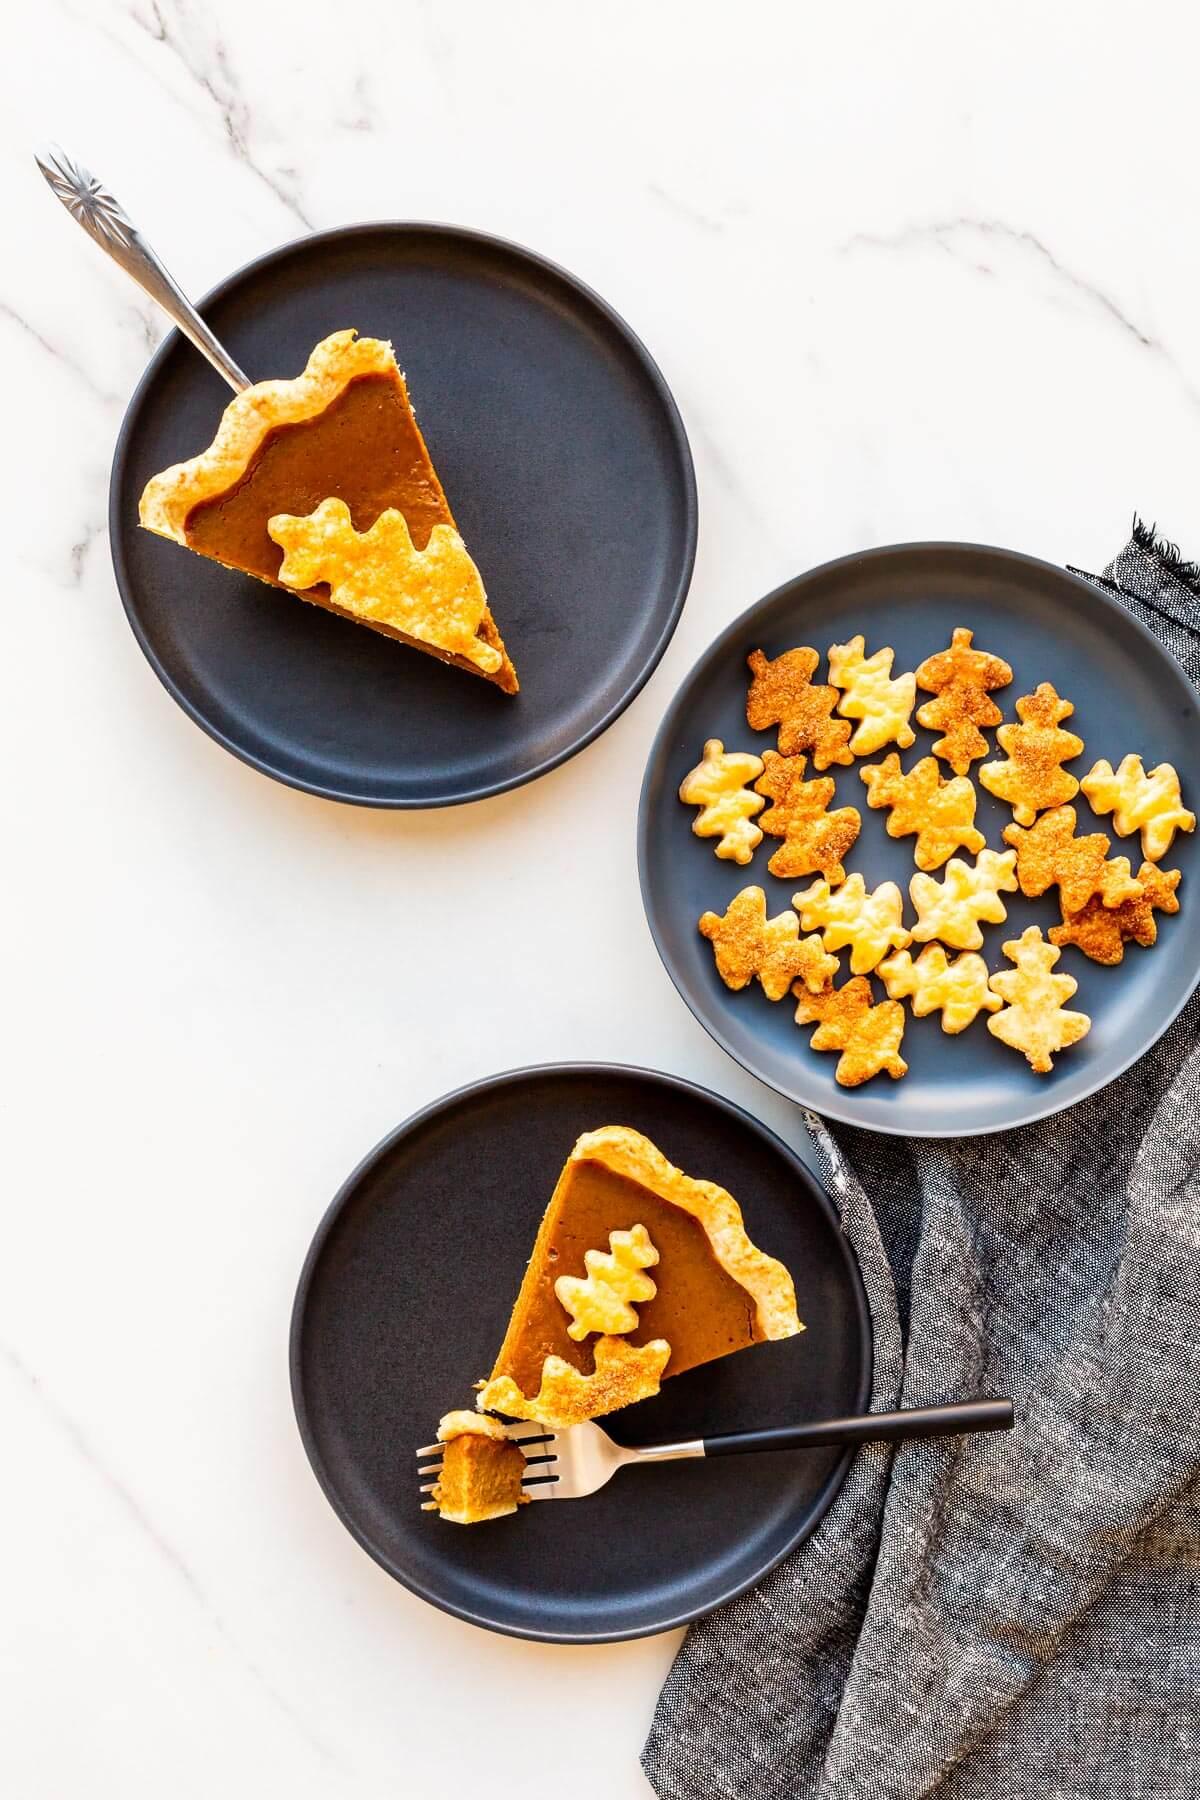 Slices of pumpkin pie served on black plates.